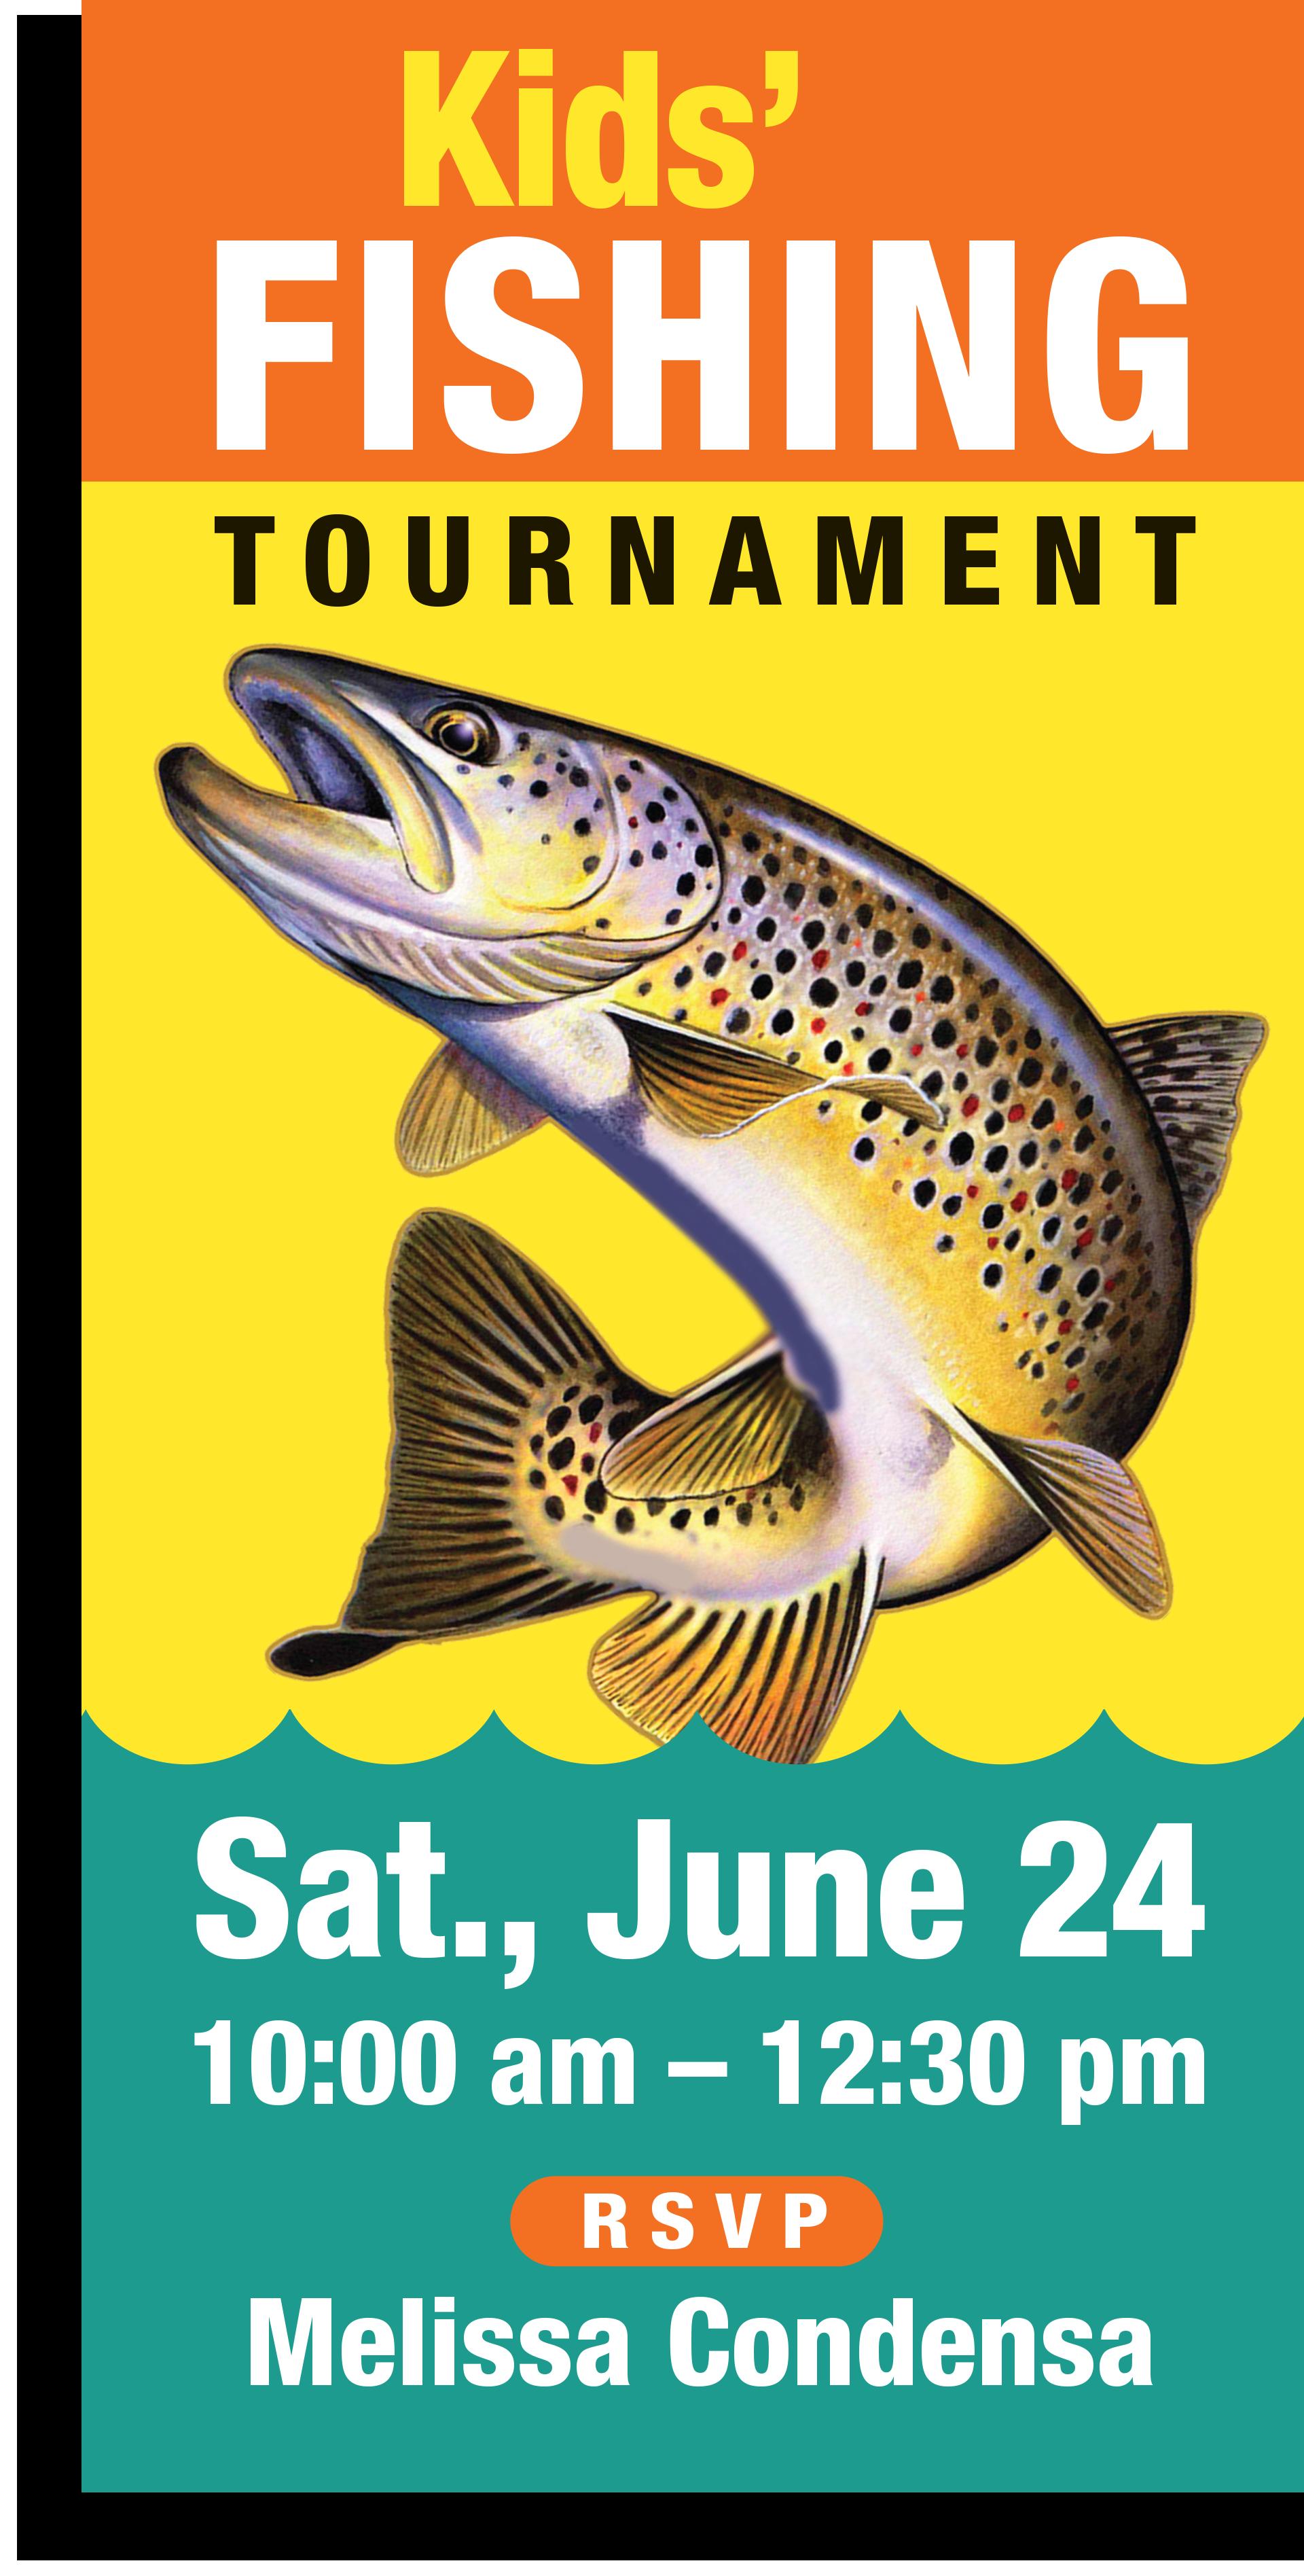 PosterOnPaper-FishingTournament-13x26half.png